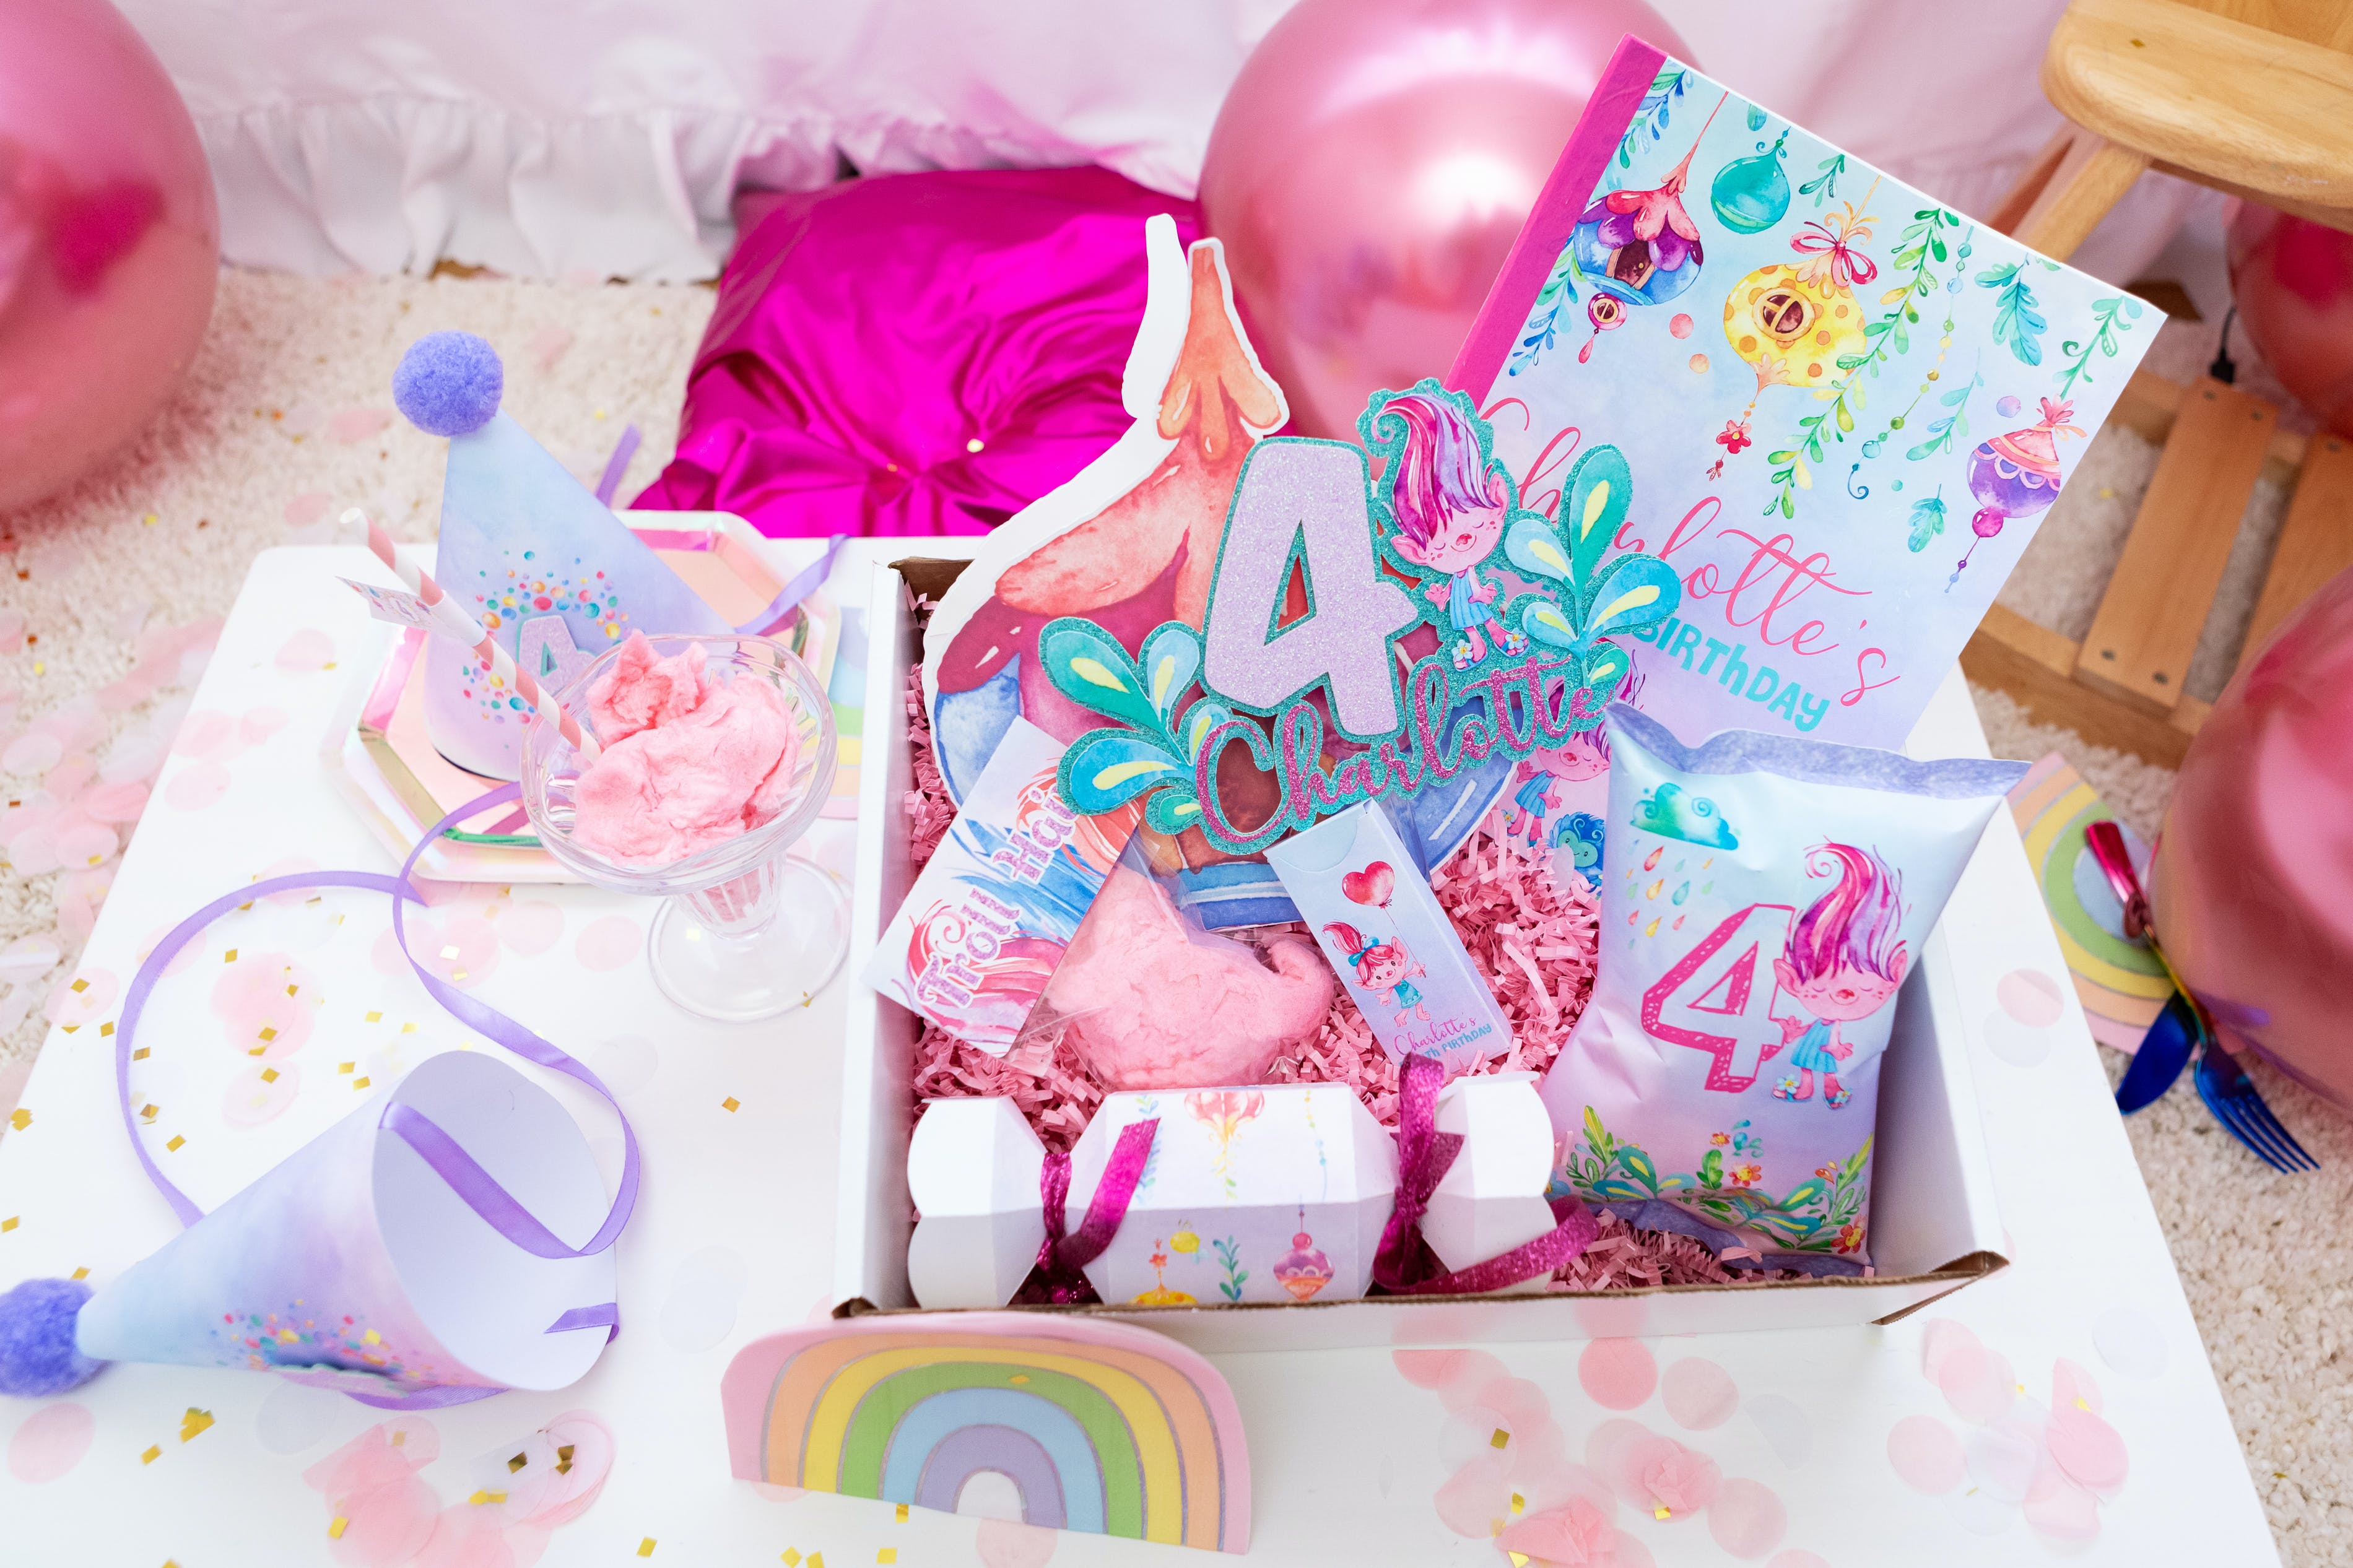 Birthday gift ideas virtual 16 Fun